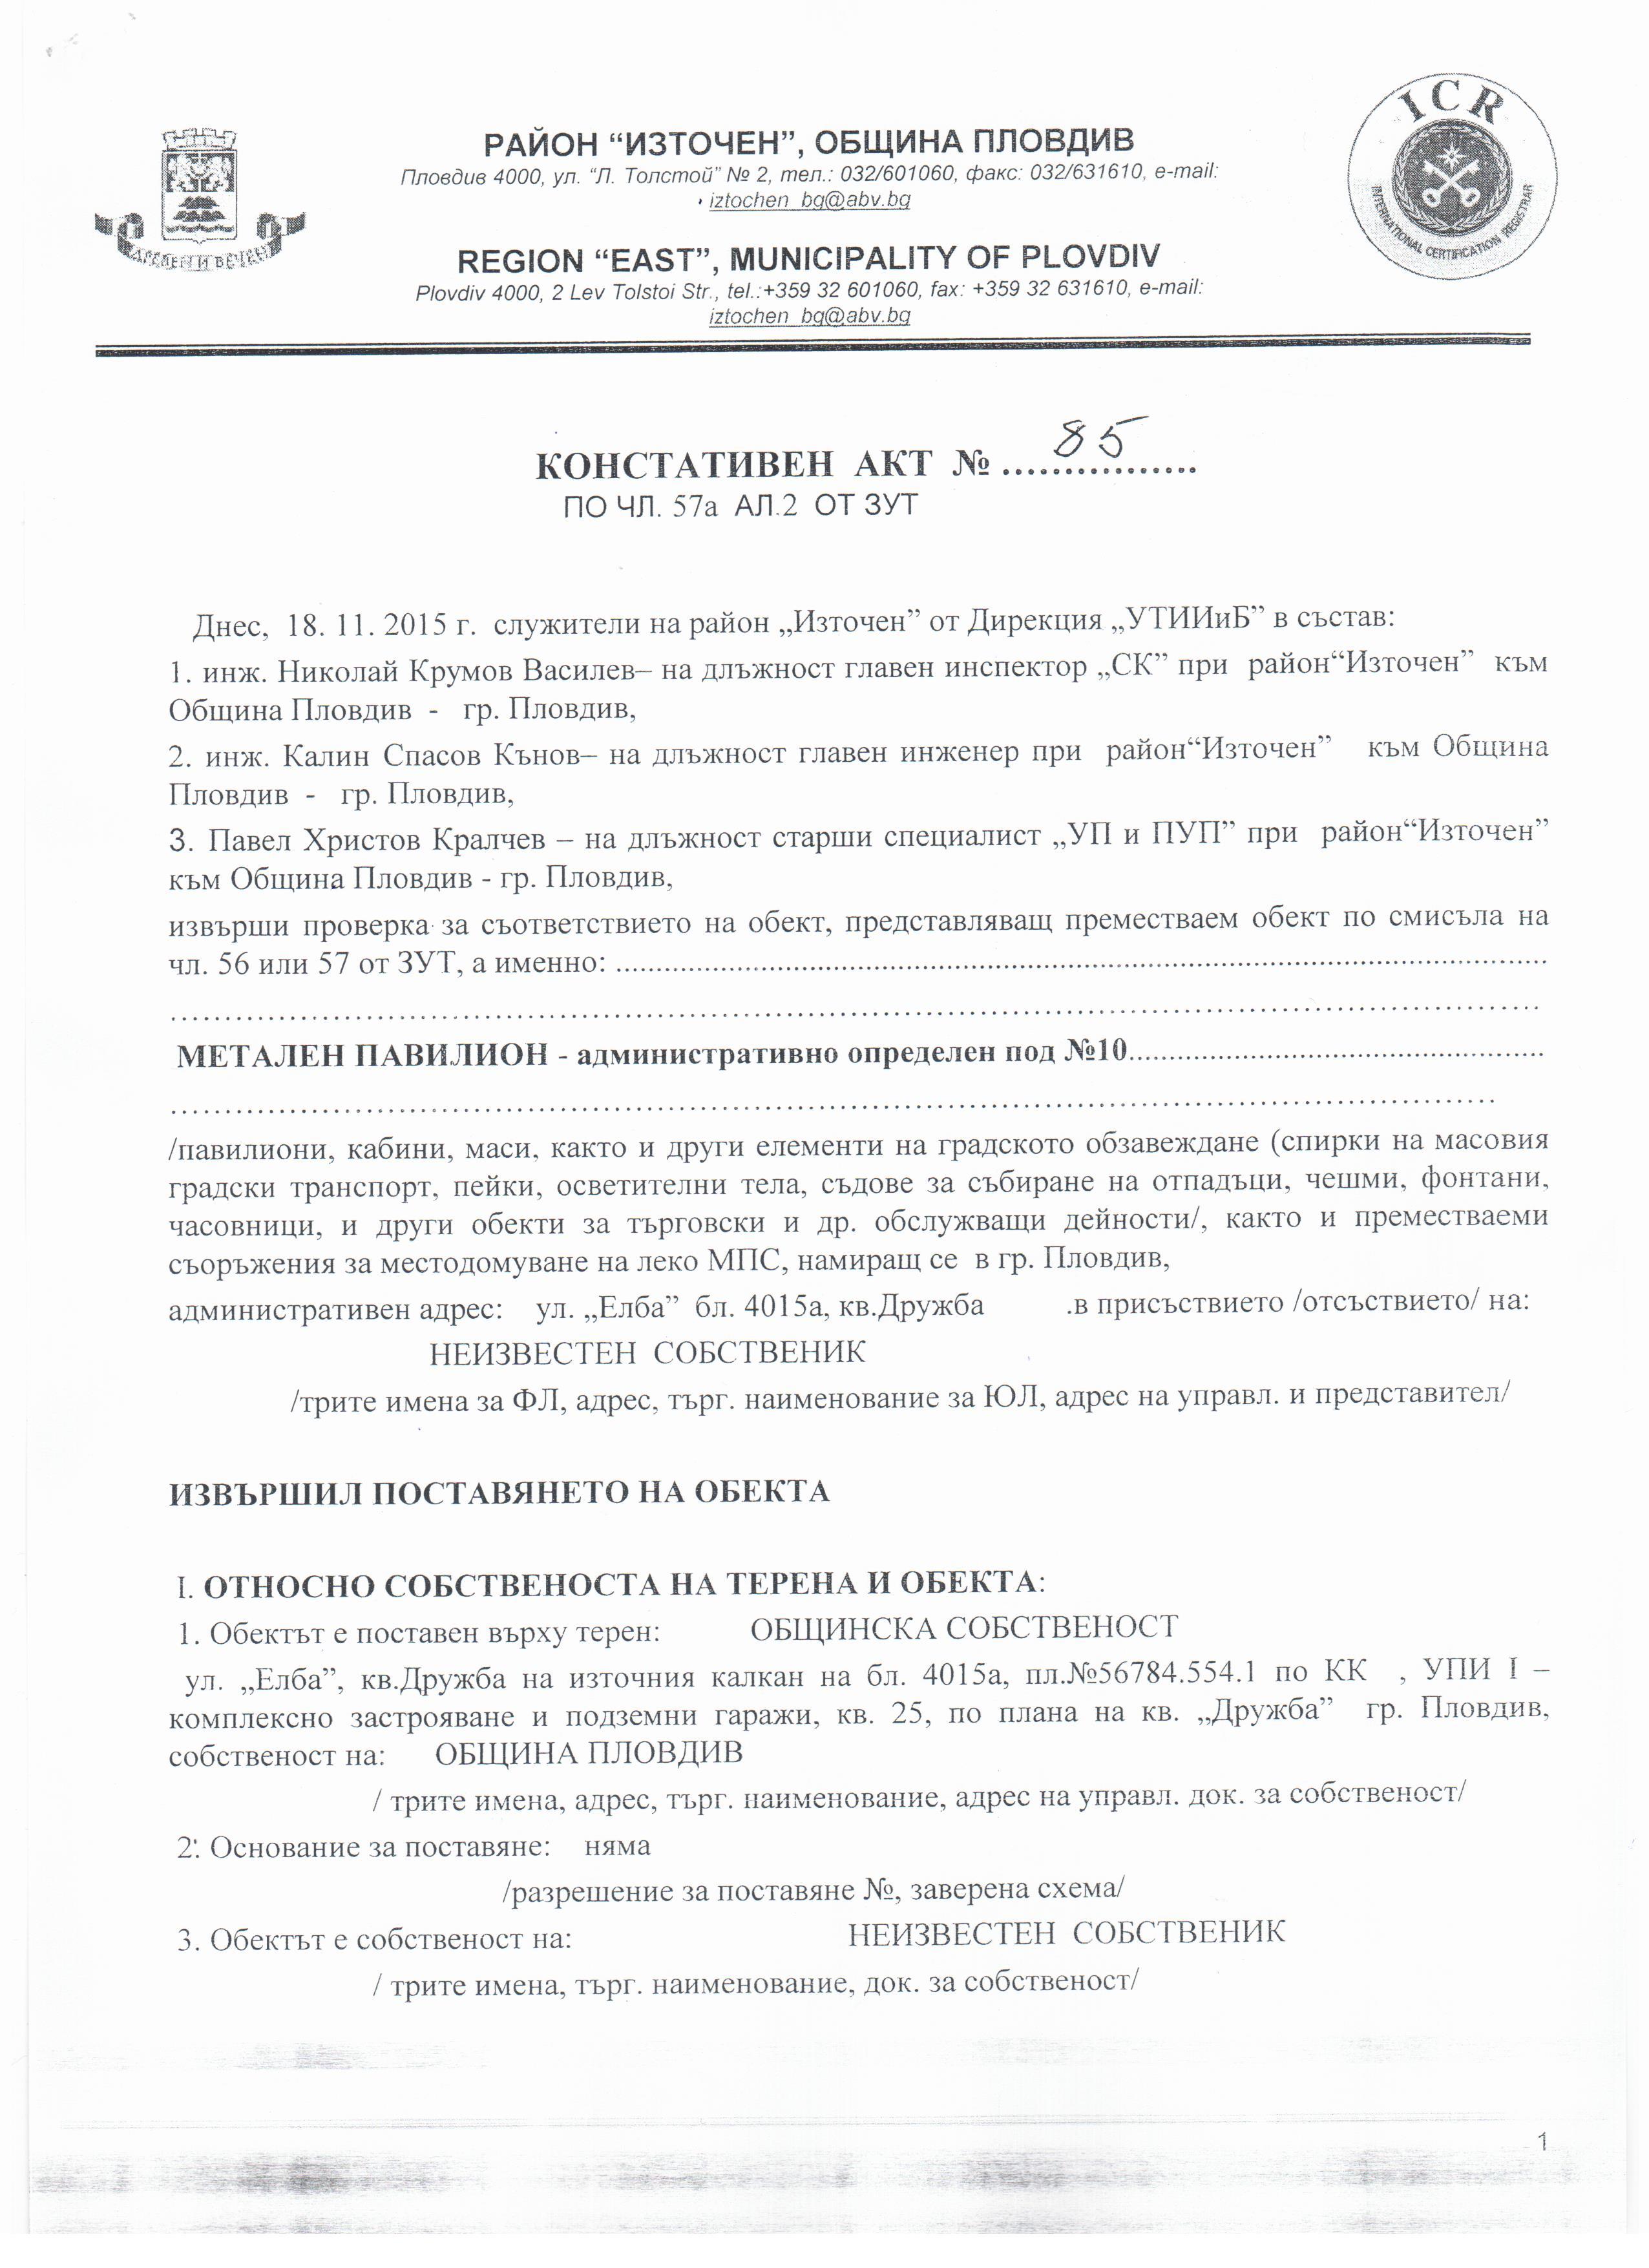 KONSTATIVEN_AKT_№85